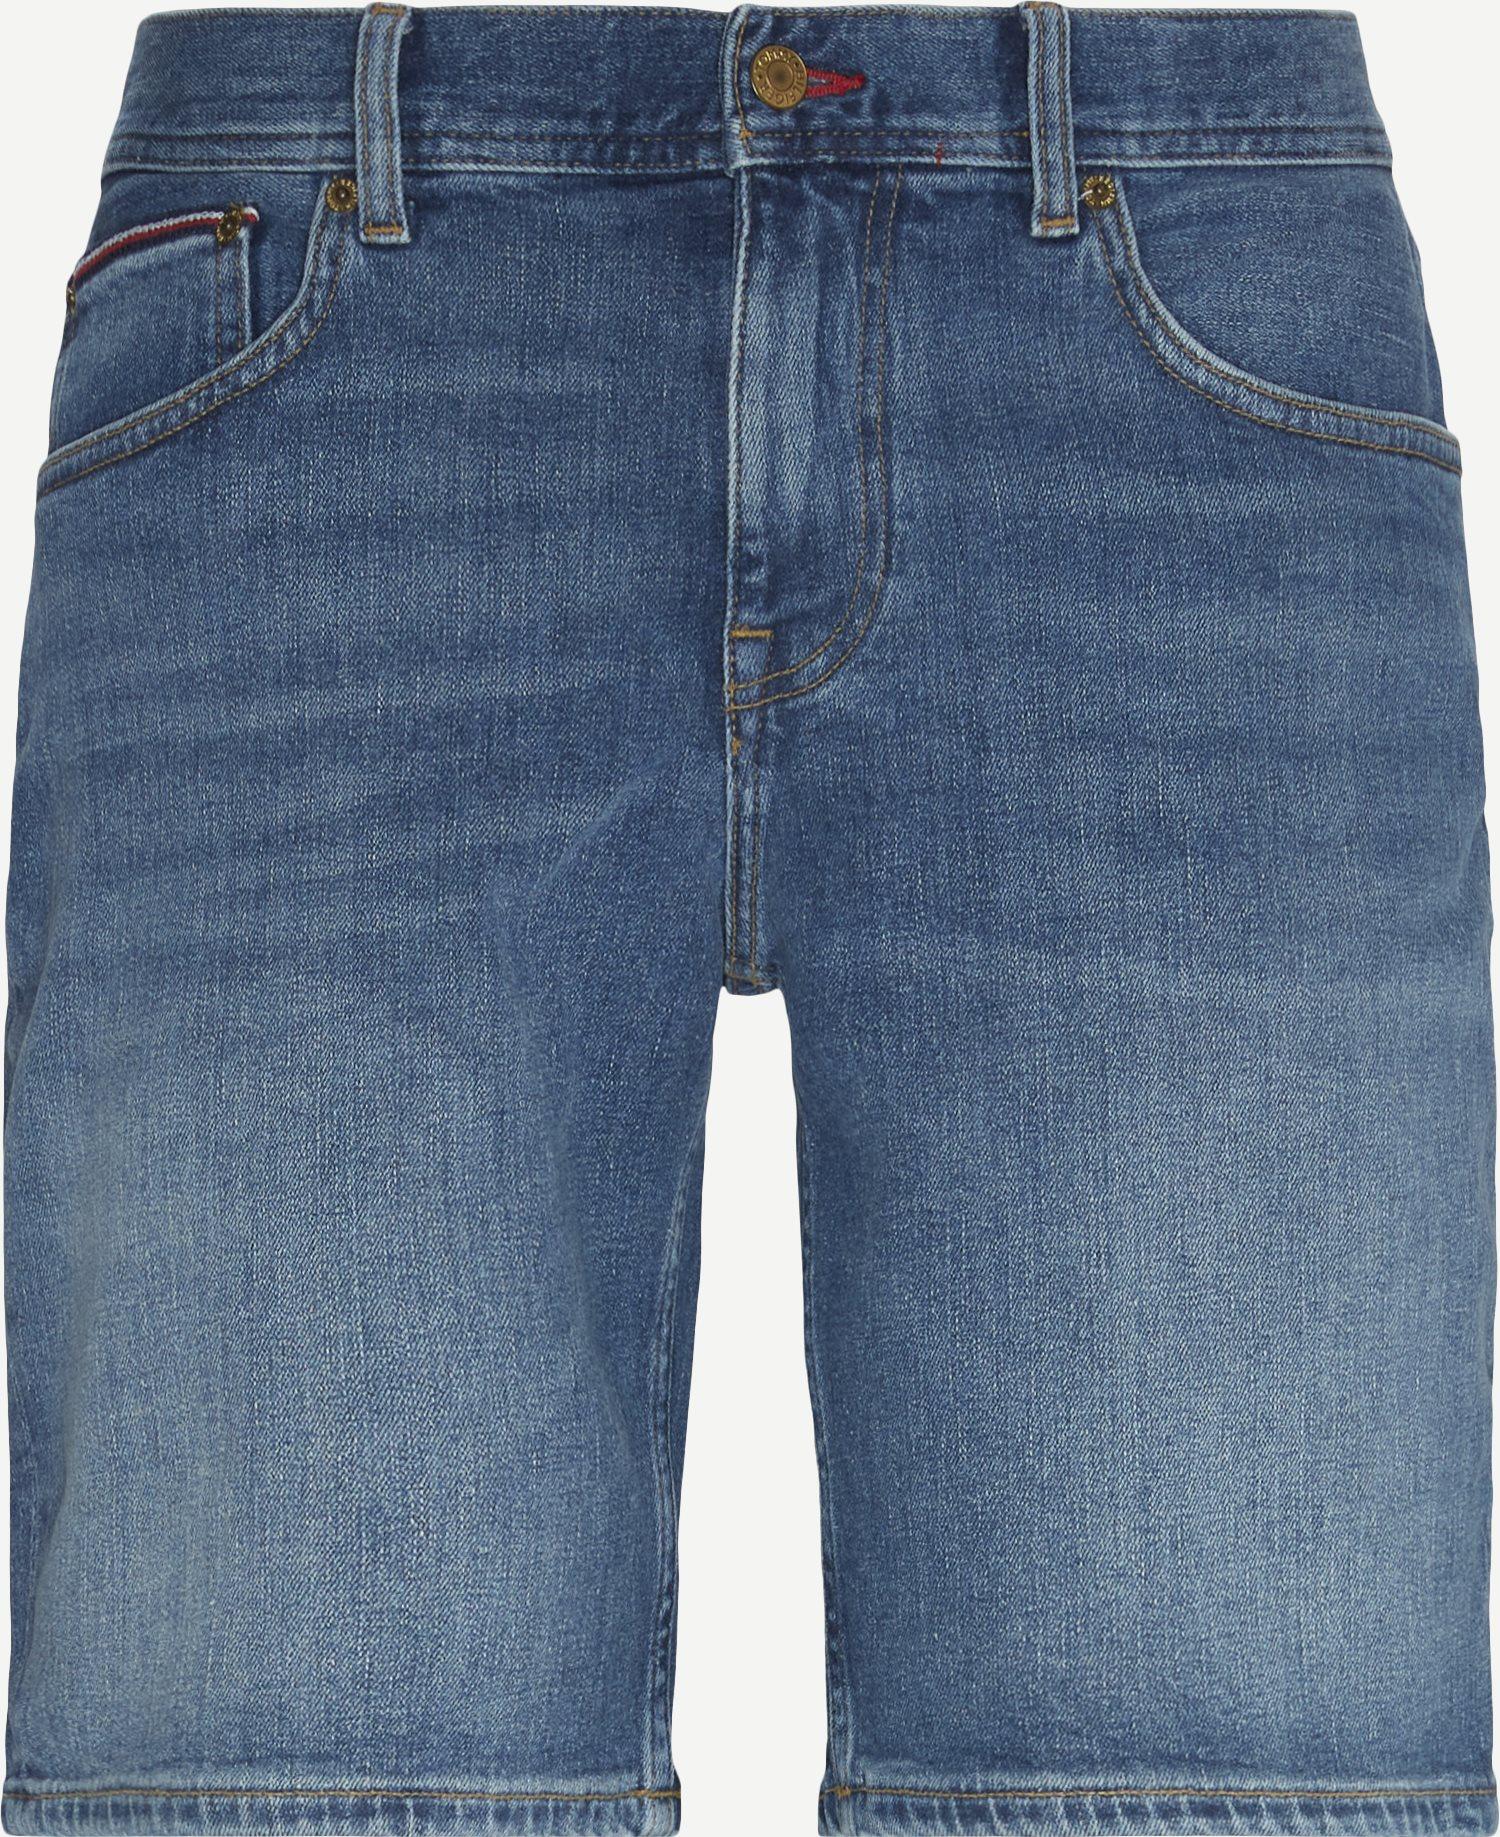 Brooklyn Short 5 Pkt Shorts - Shorts - Regular fit - Denim